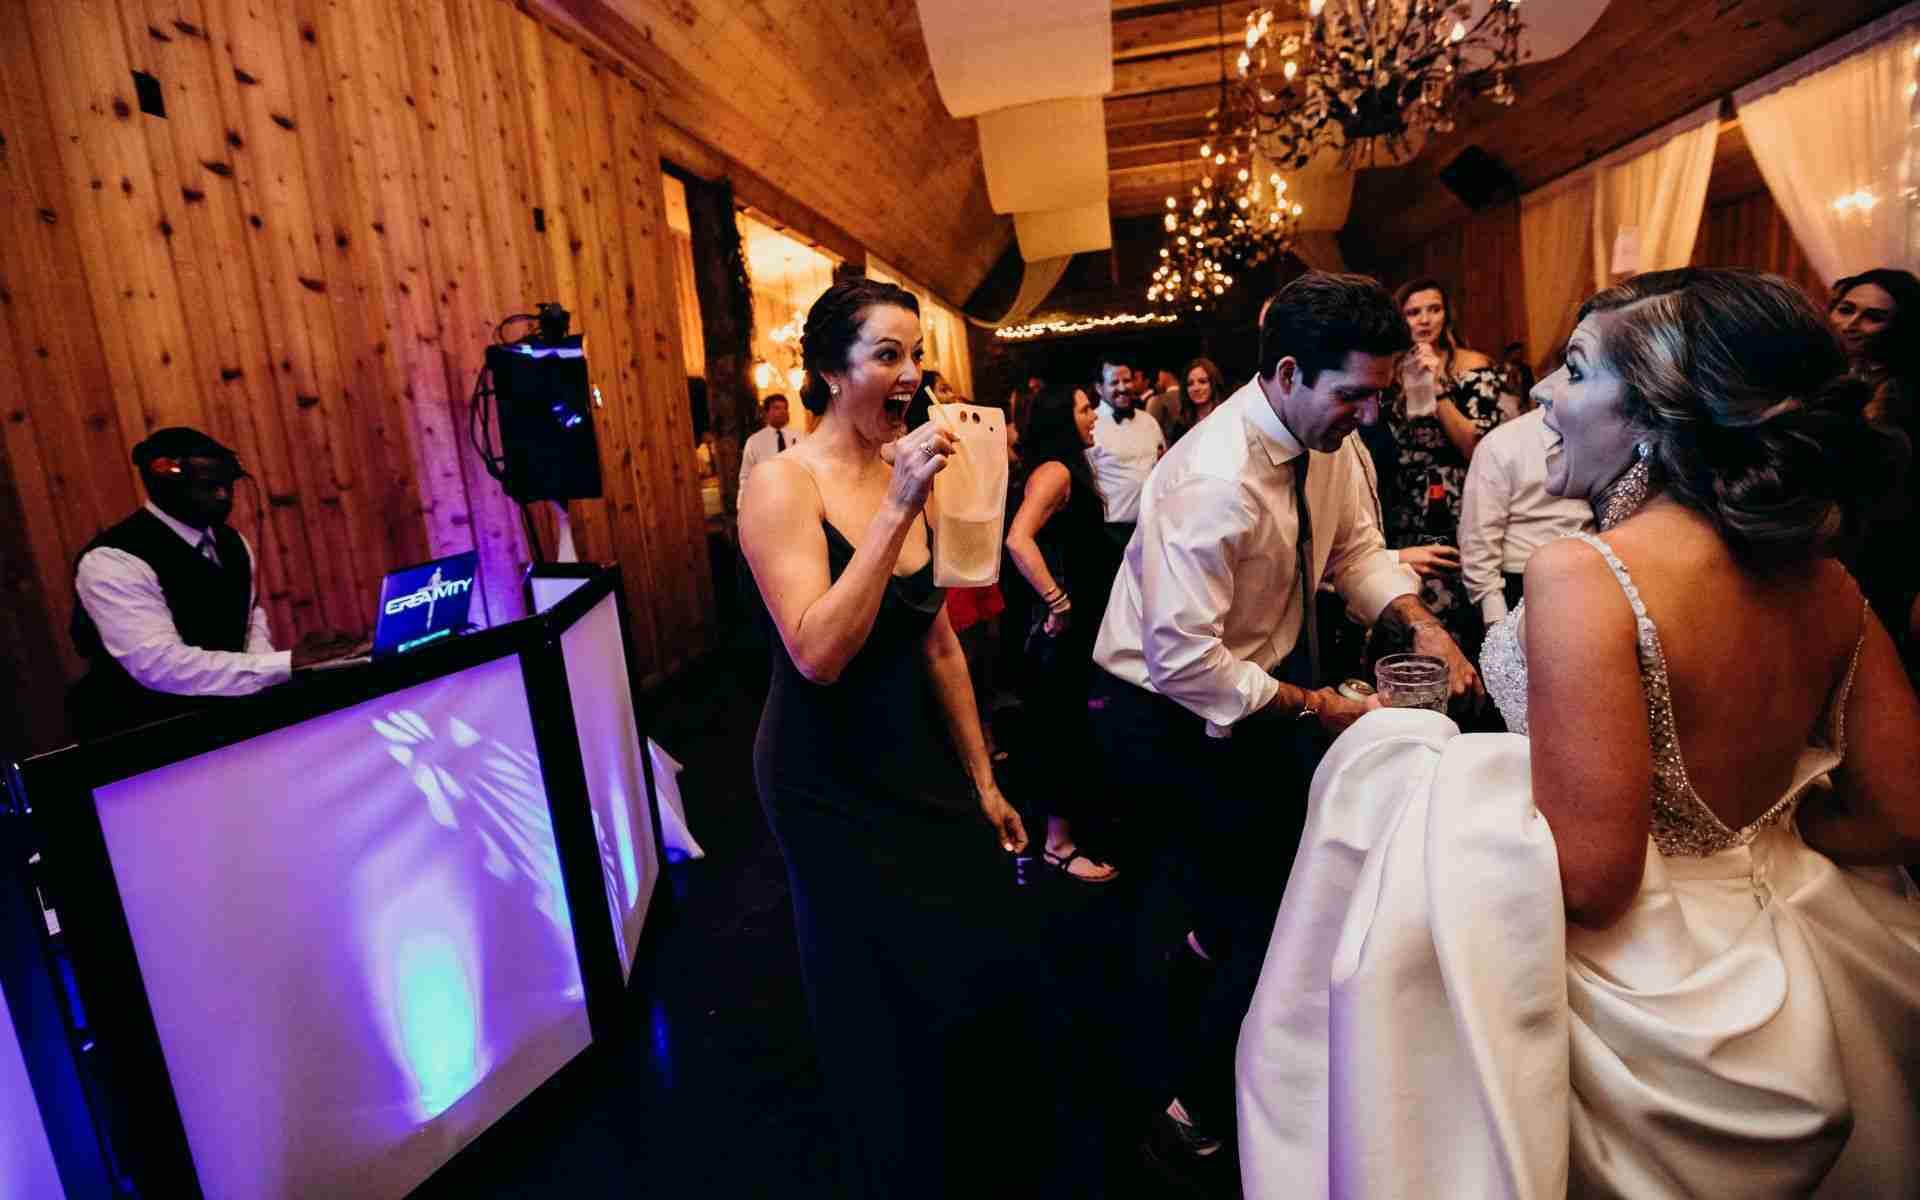 Wedding DJ_Destination Wedding DJ_DJ Creativity at Erin & Danny's Wedding